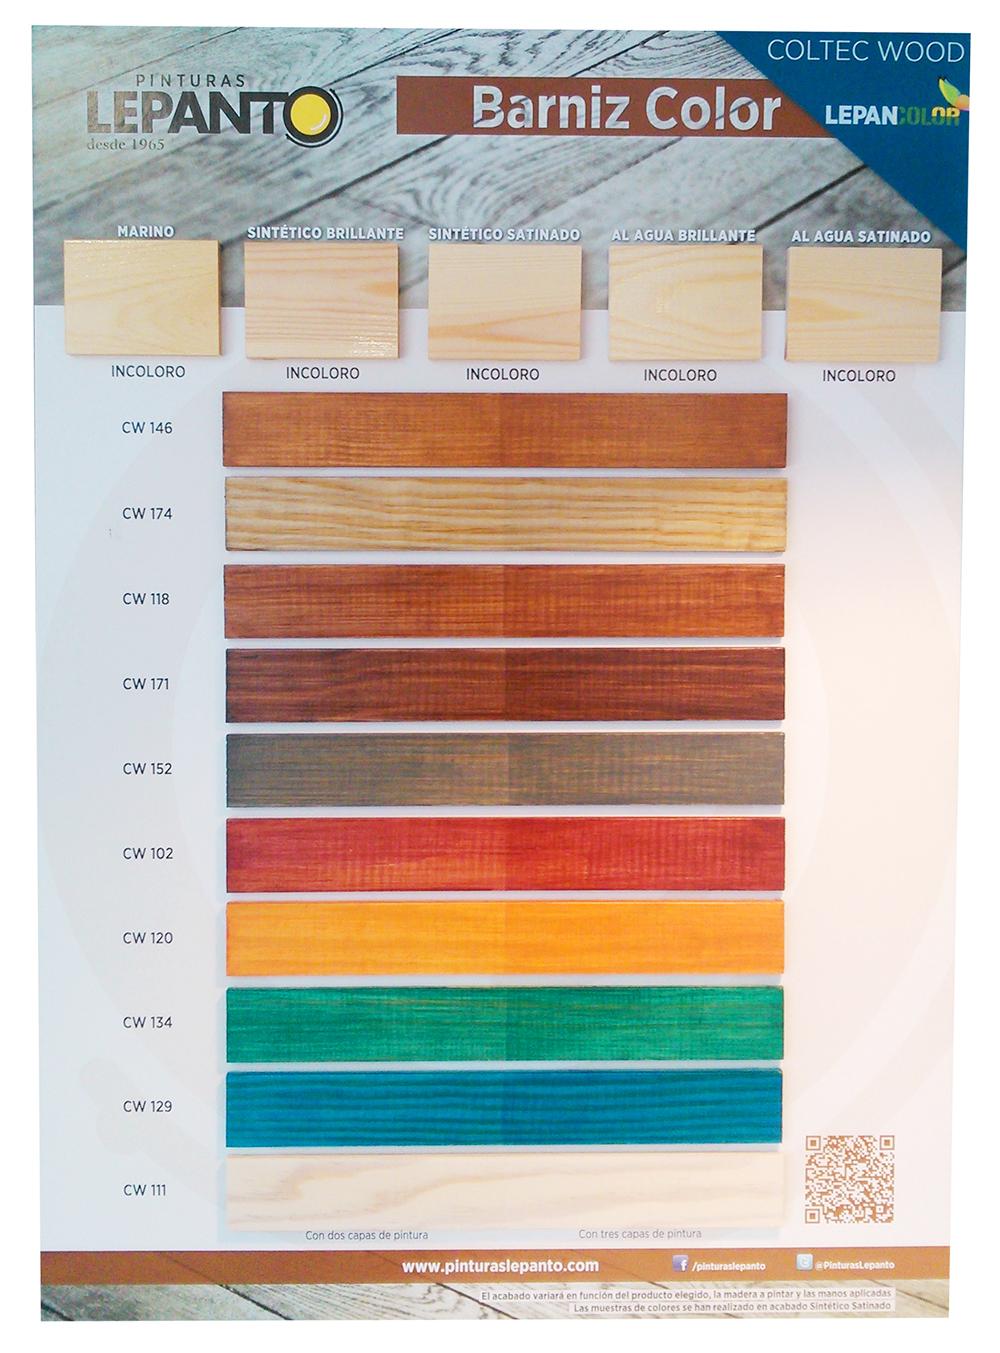 Barniz color pinturas lepanto fabricante de pintura - Pintura para madera colores ...